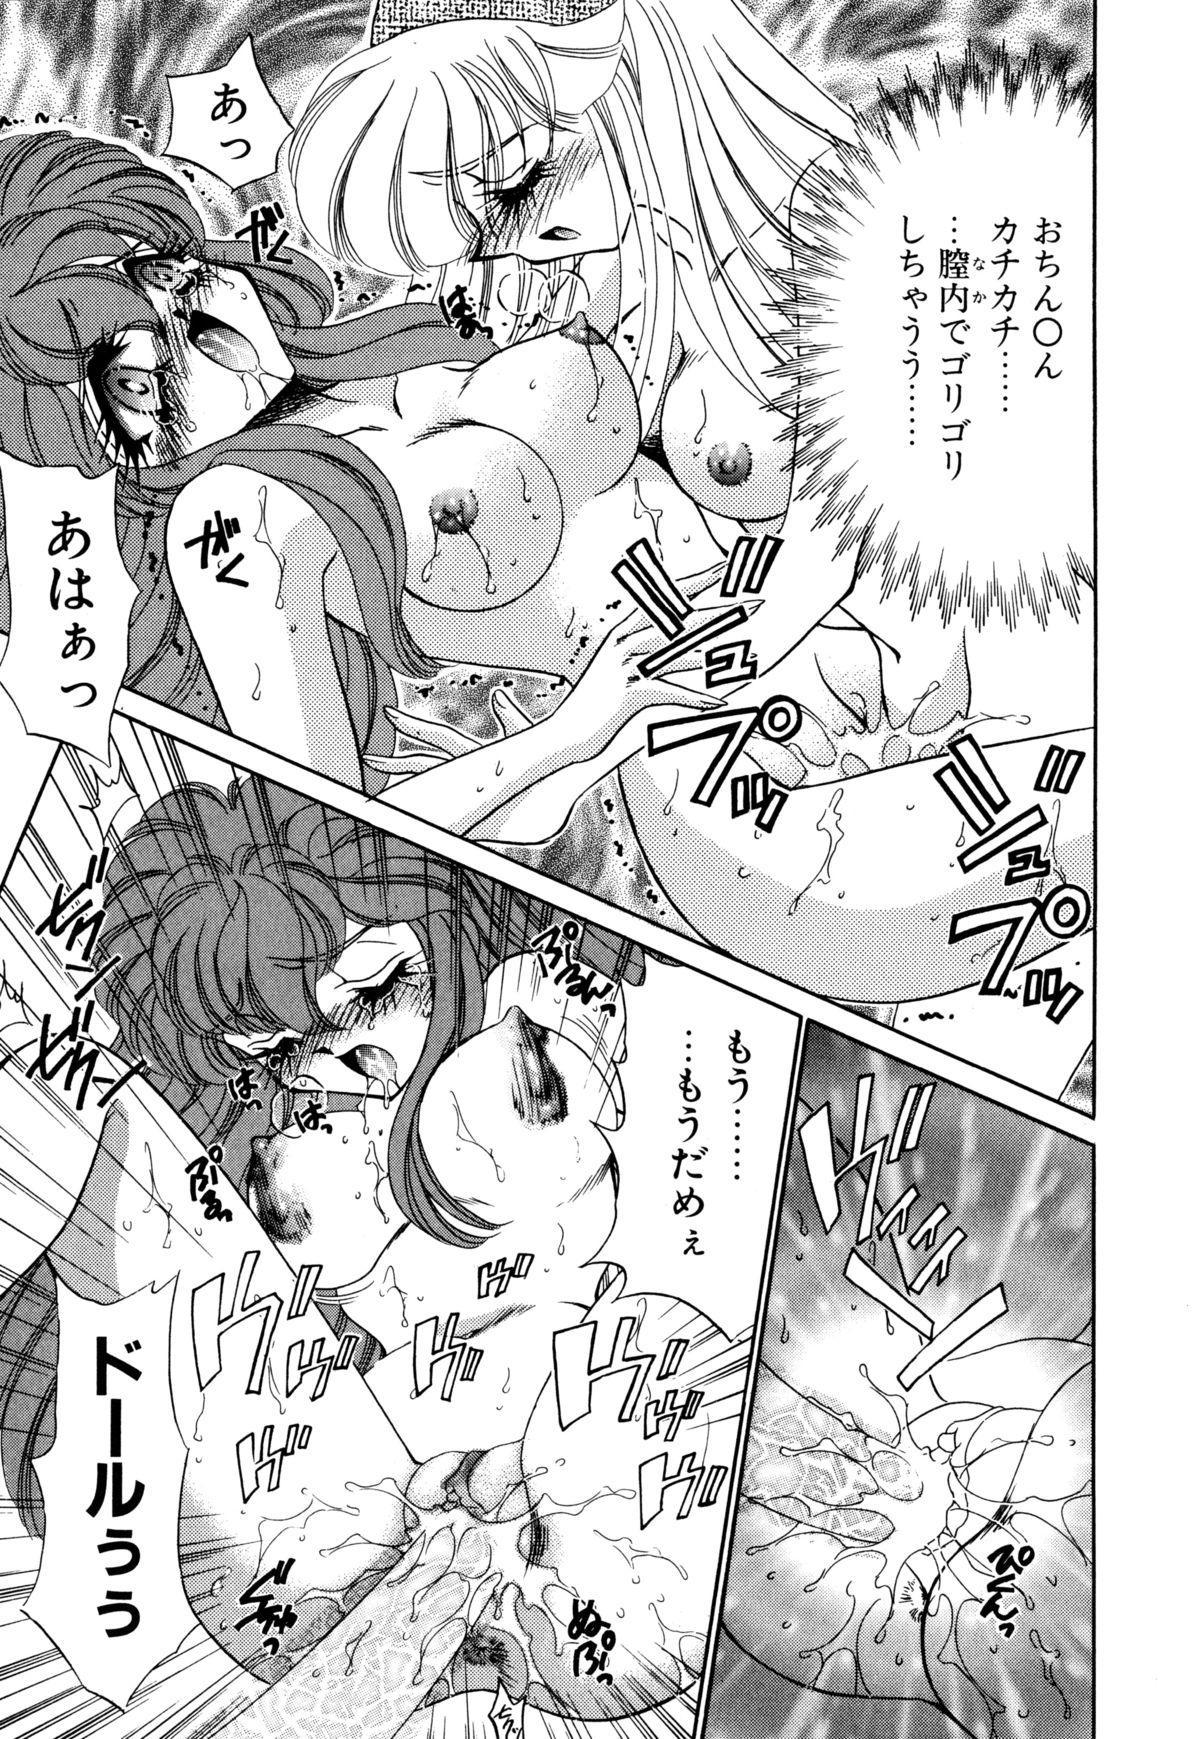 Kigurumi Sentai Quiltian 167